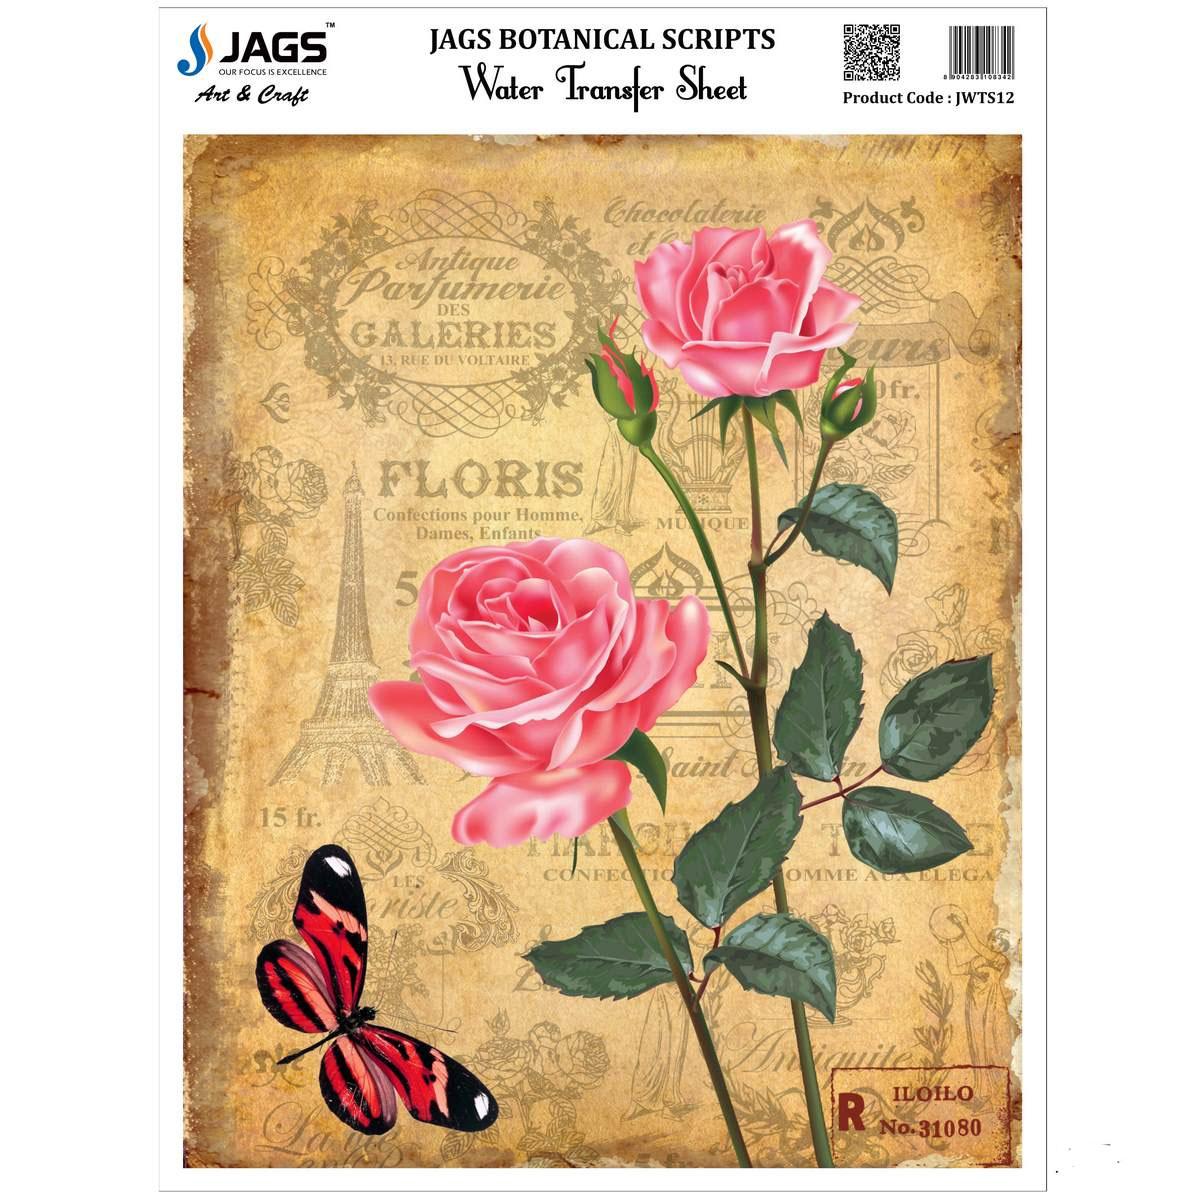 Jags Water Transfer Sheet Botanical Scripts JWTS12